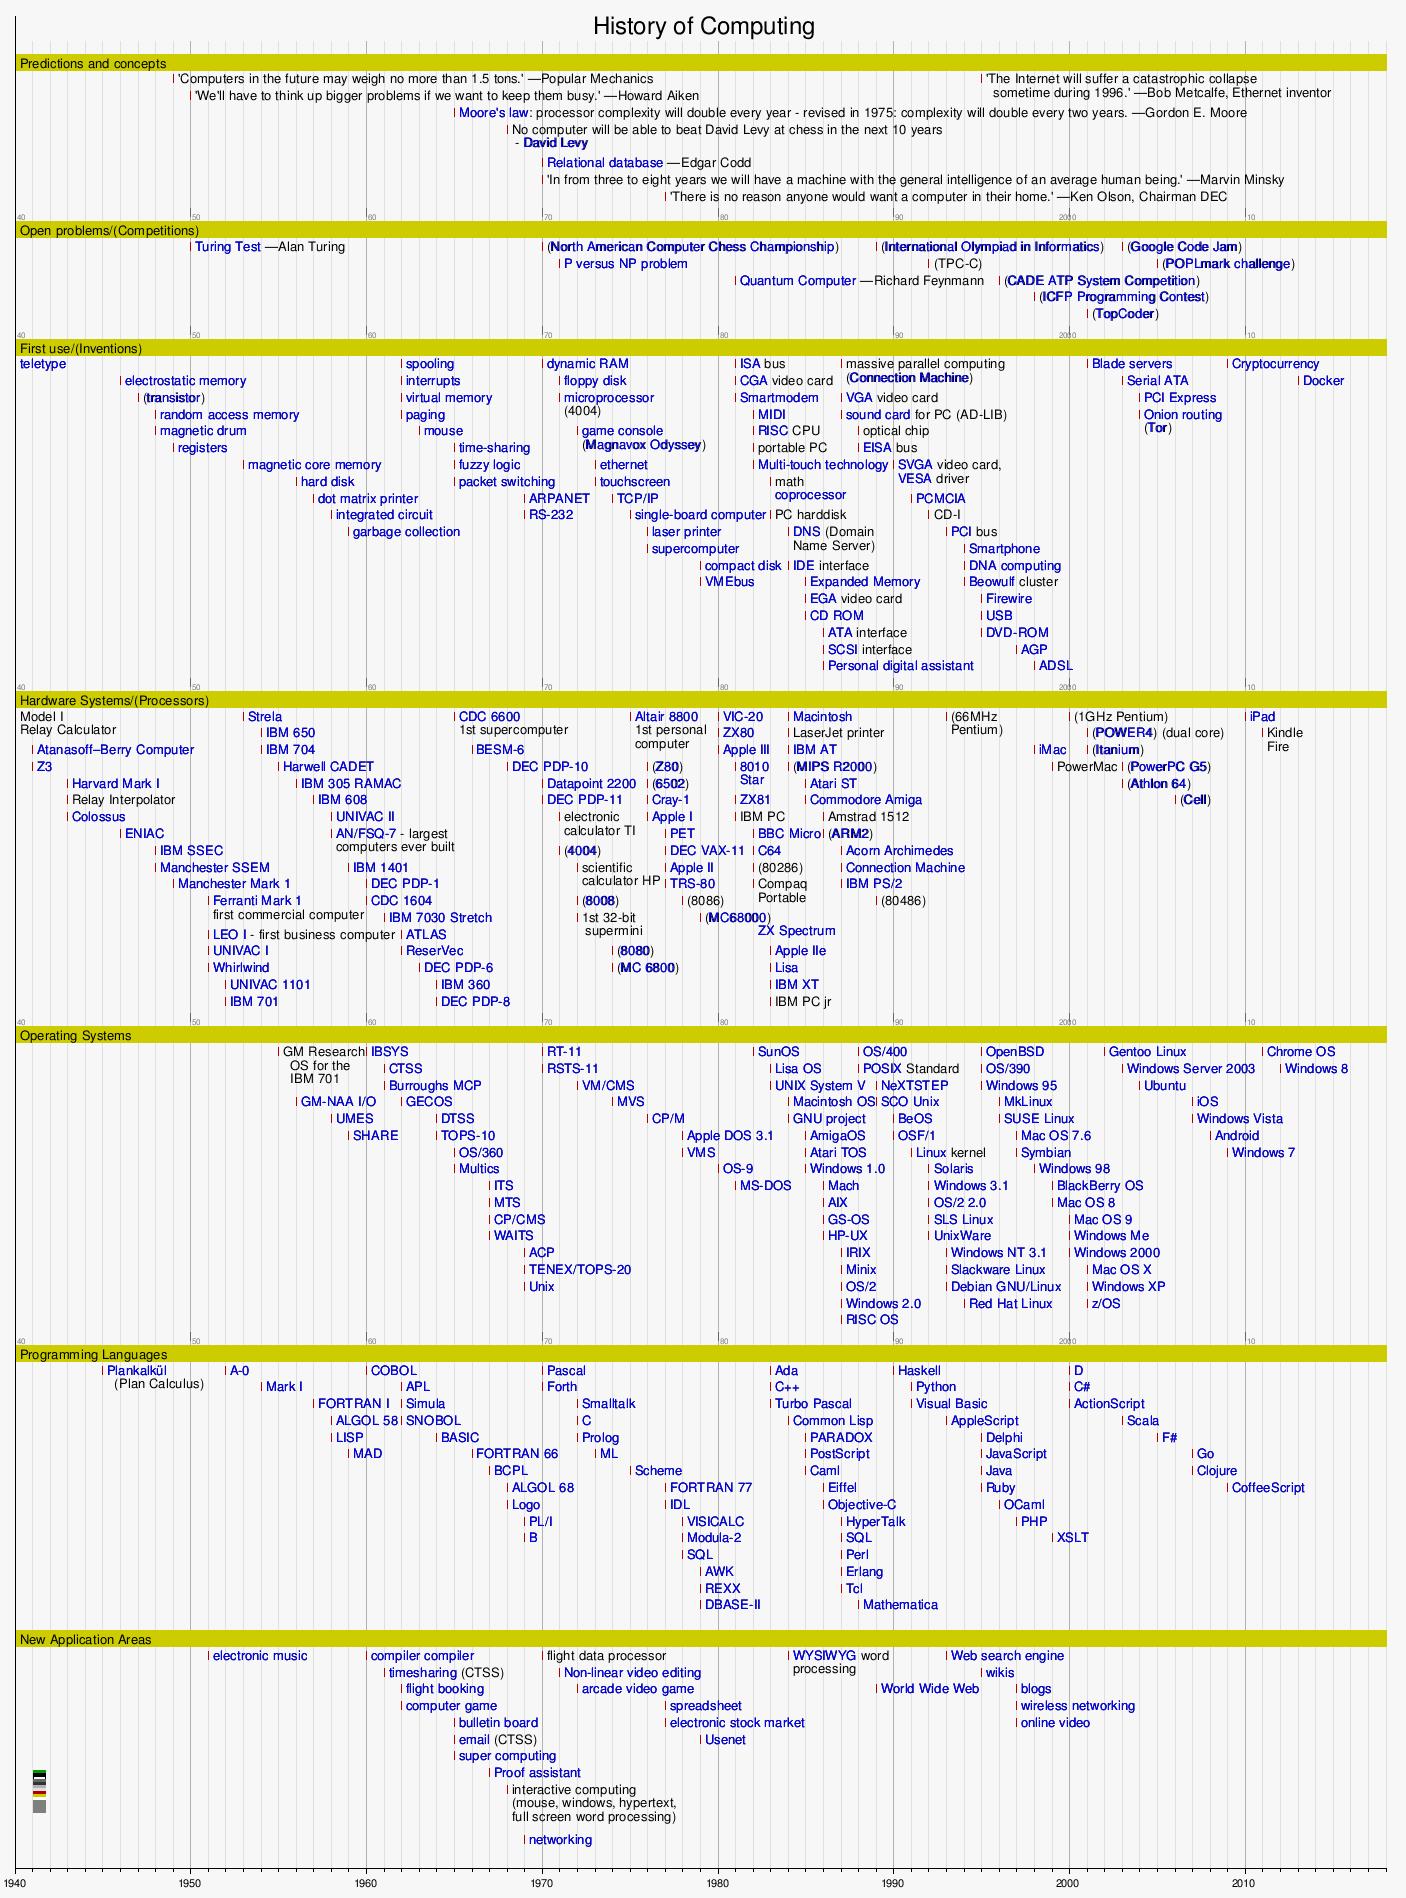 Timeline Of Computing